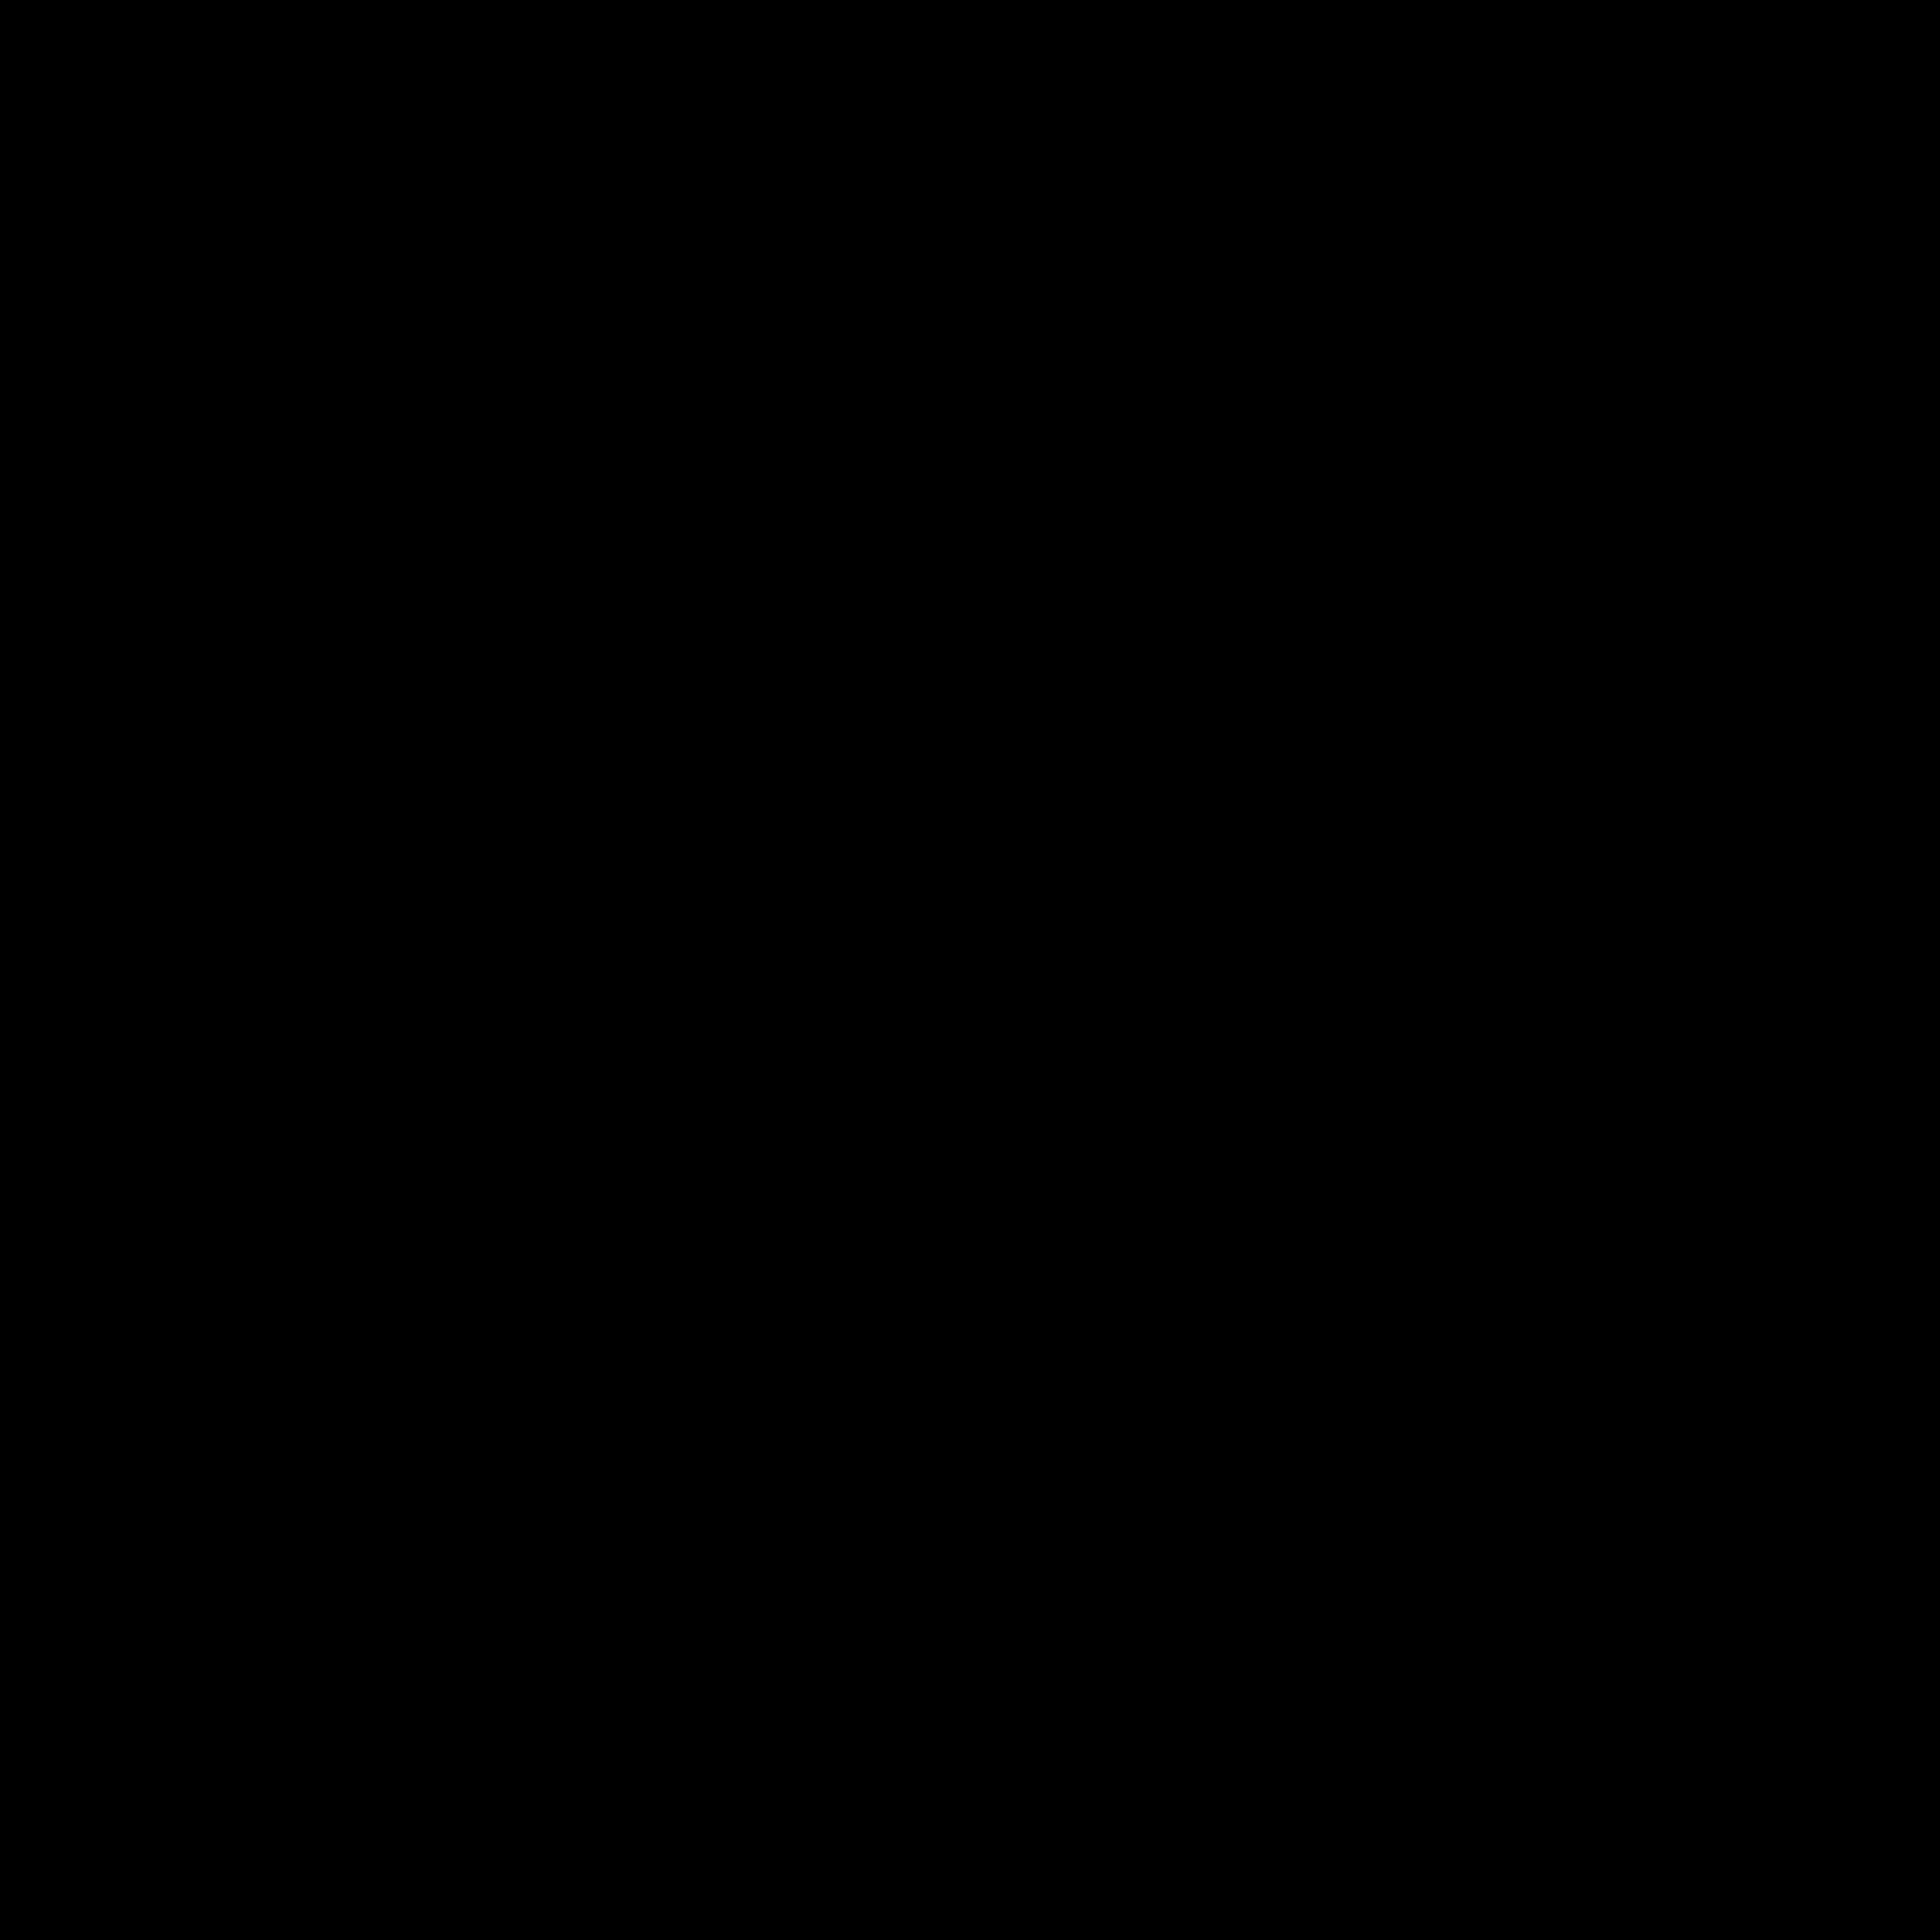 DVD Video mini Logo PNG Transparent & SVG Vector.